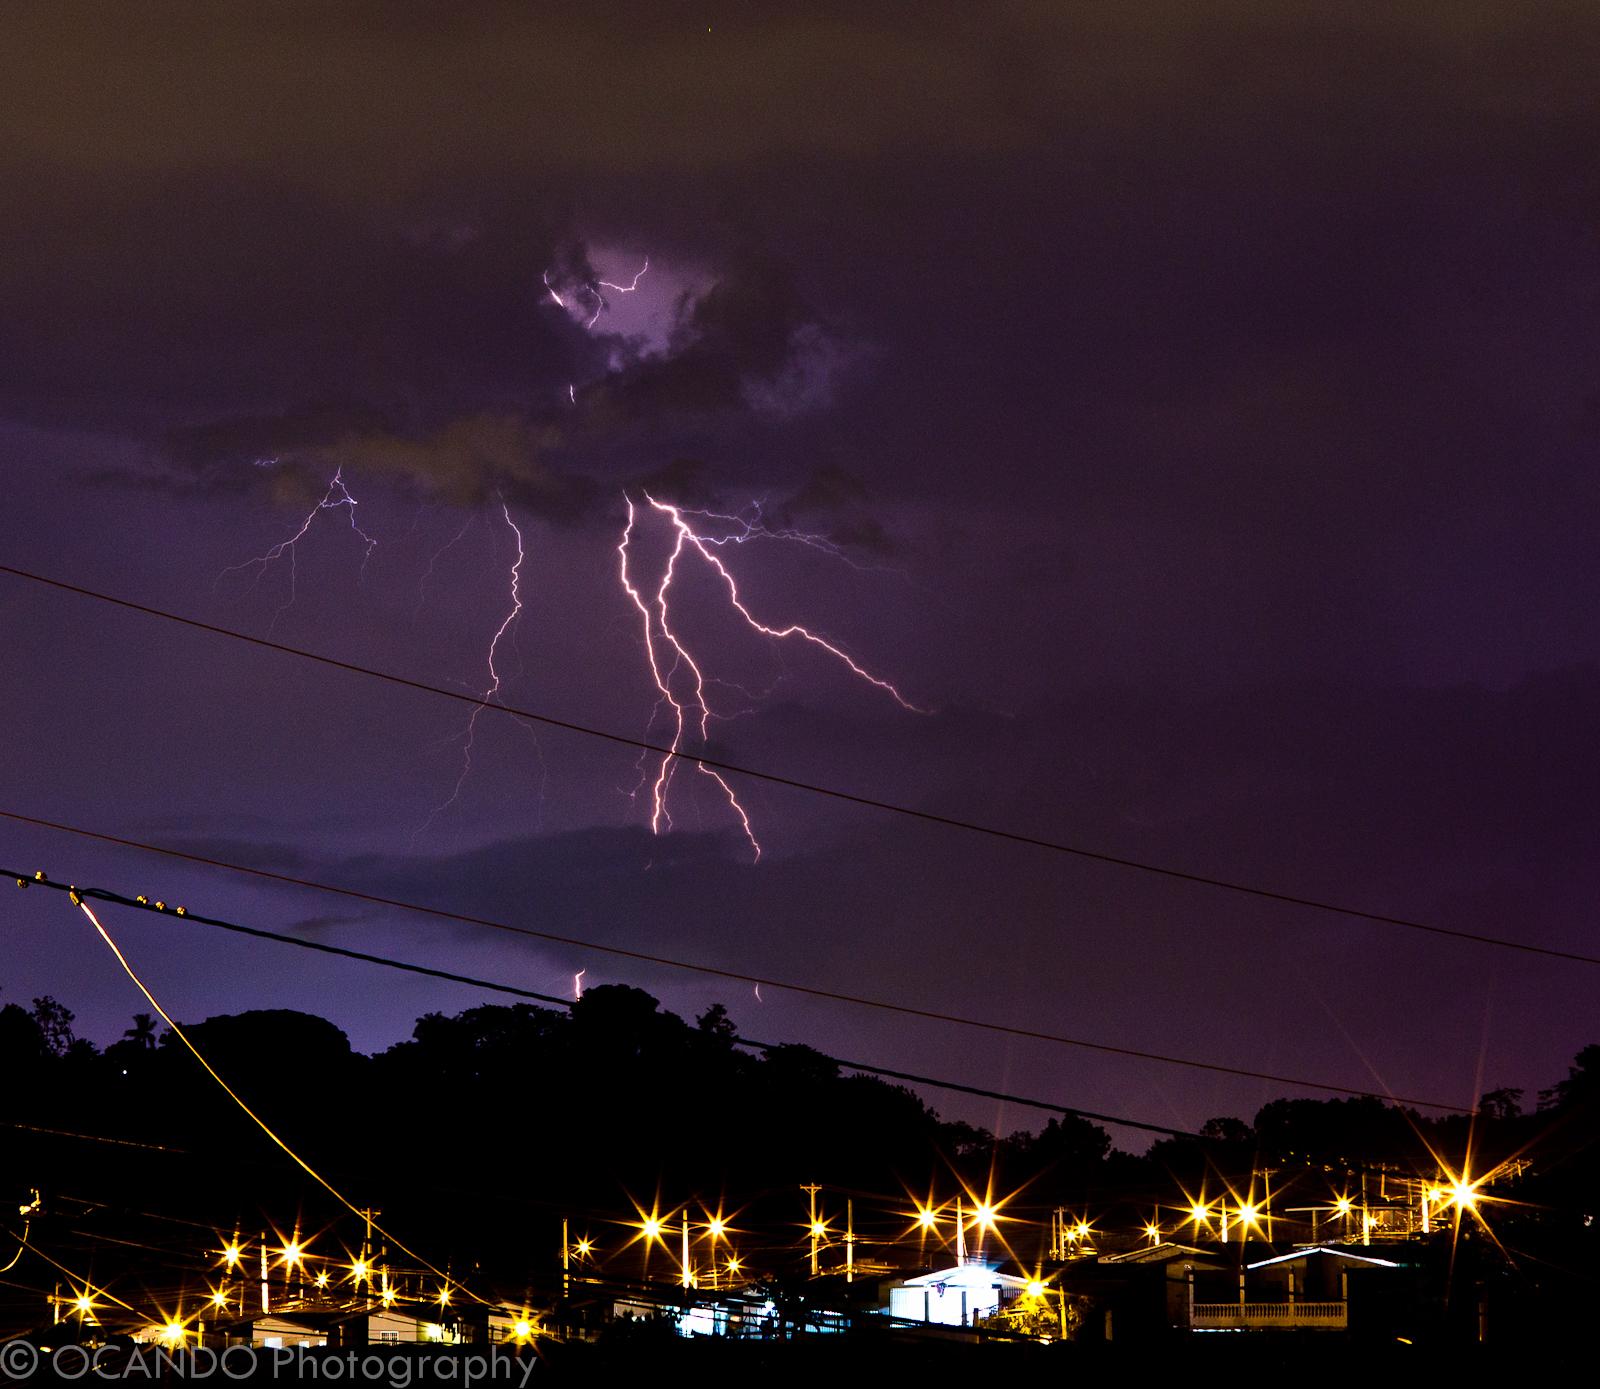 Lightning Photography with Magic Lantern: Digital